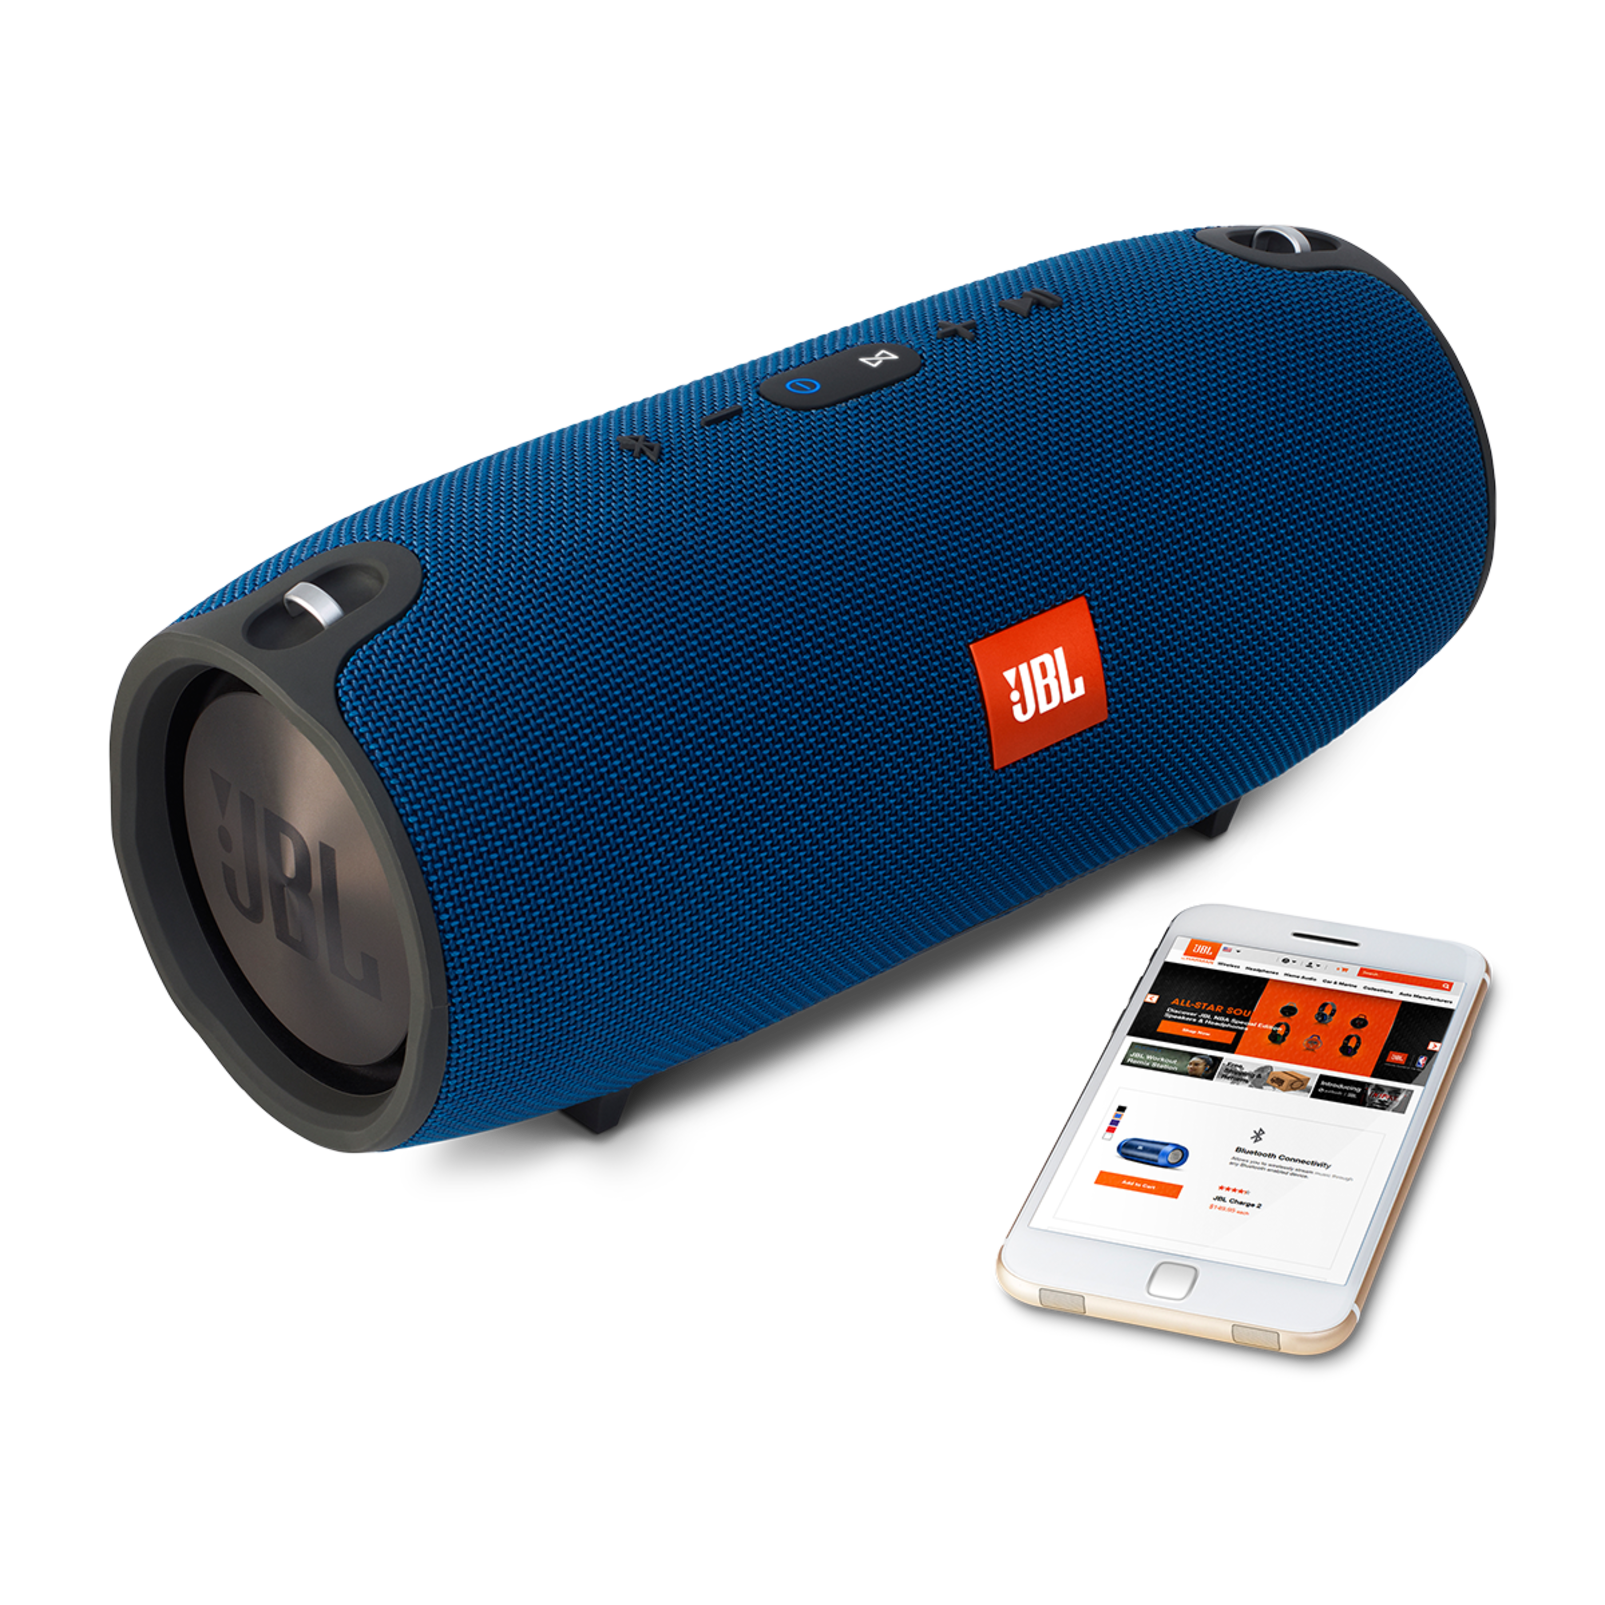 JBL Xtreme - Blue - Splashproof portable speaker with ultra-powerful performance - Detailshot 4